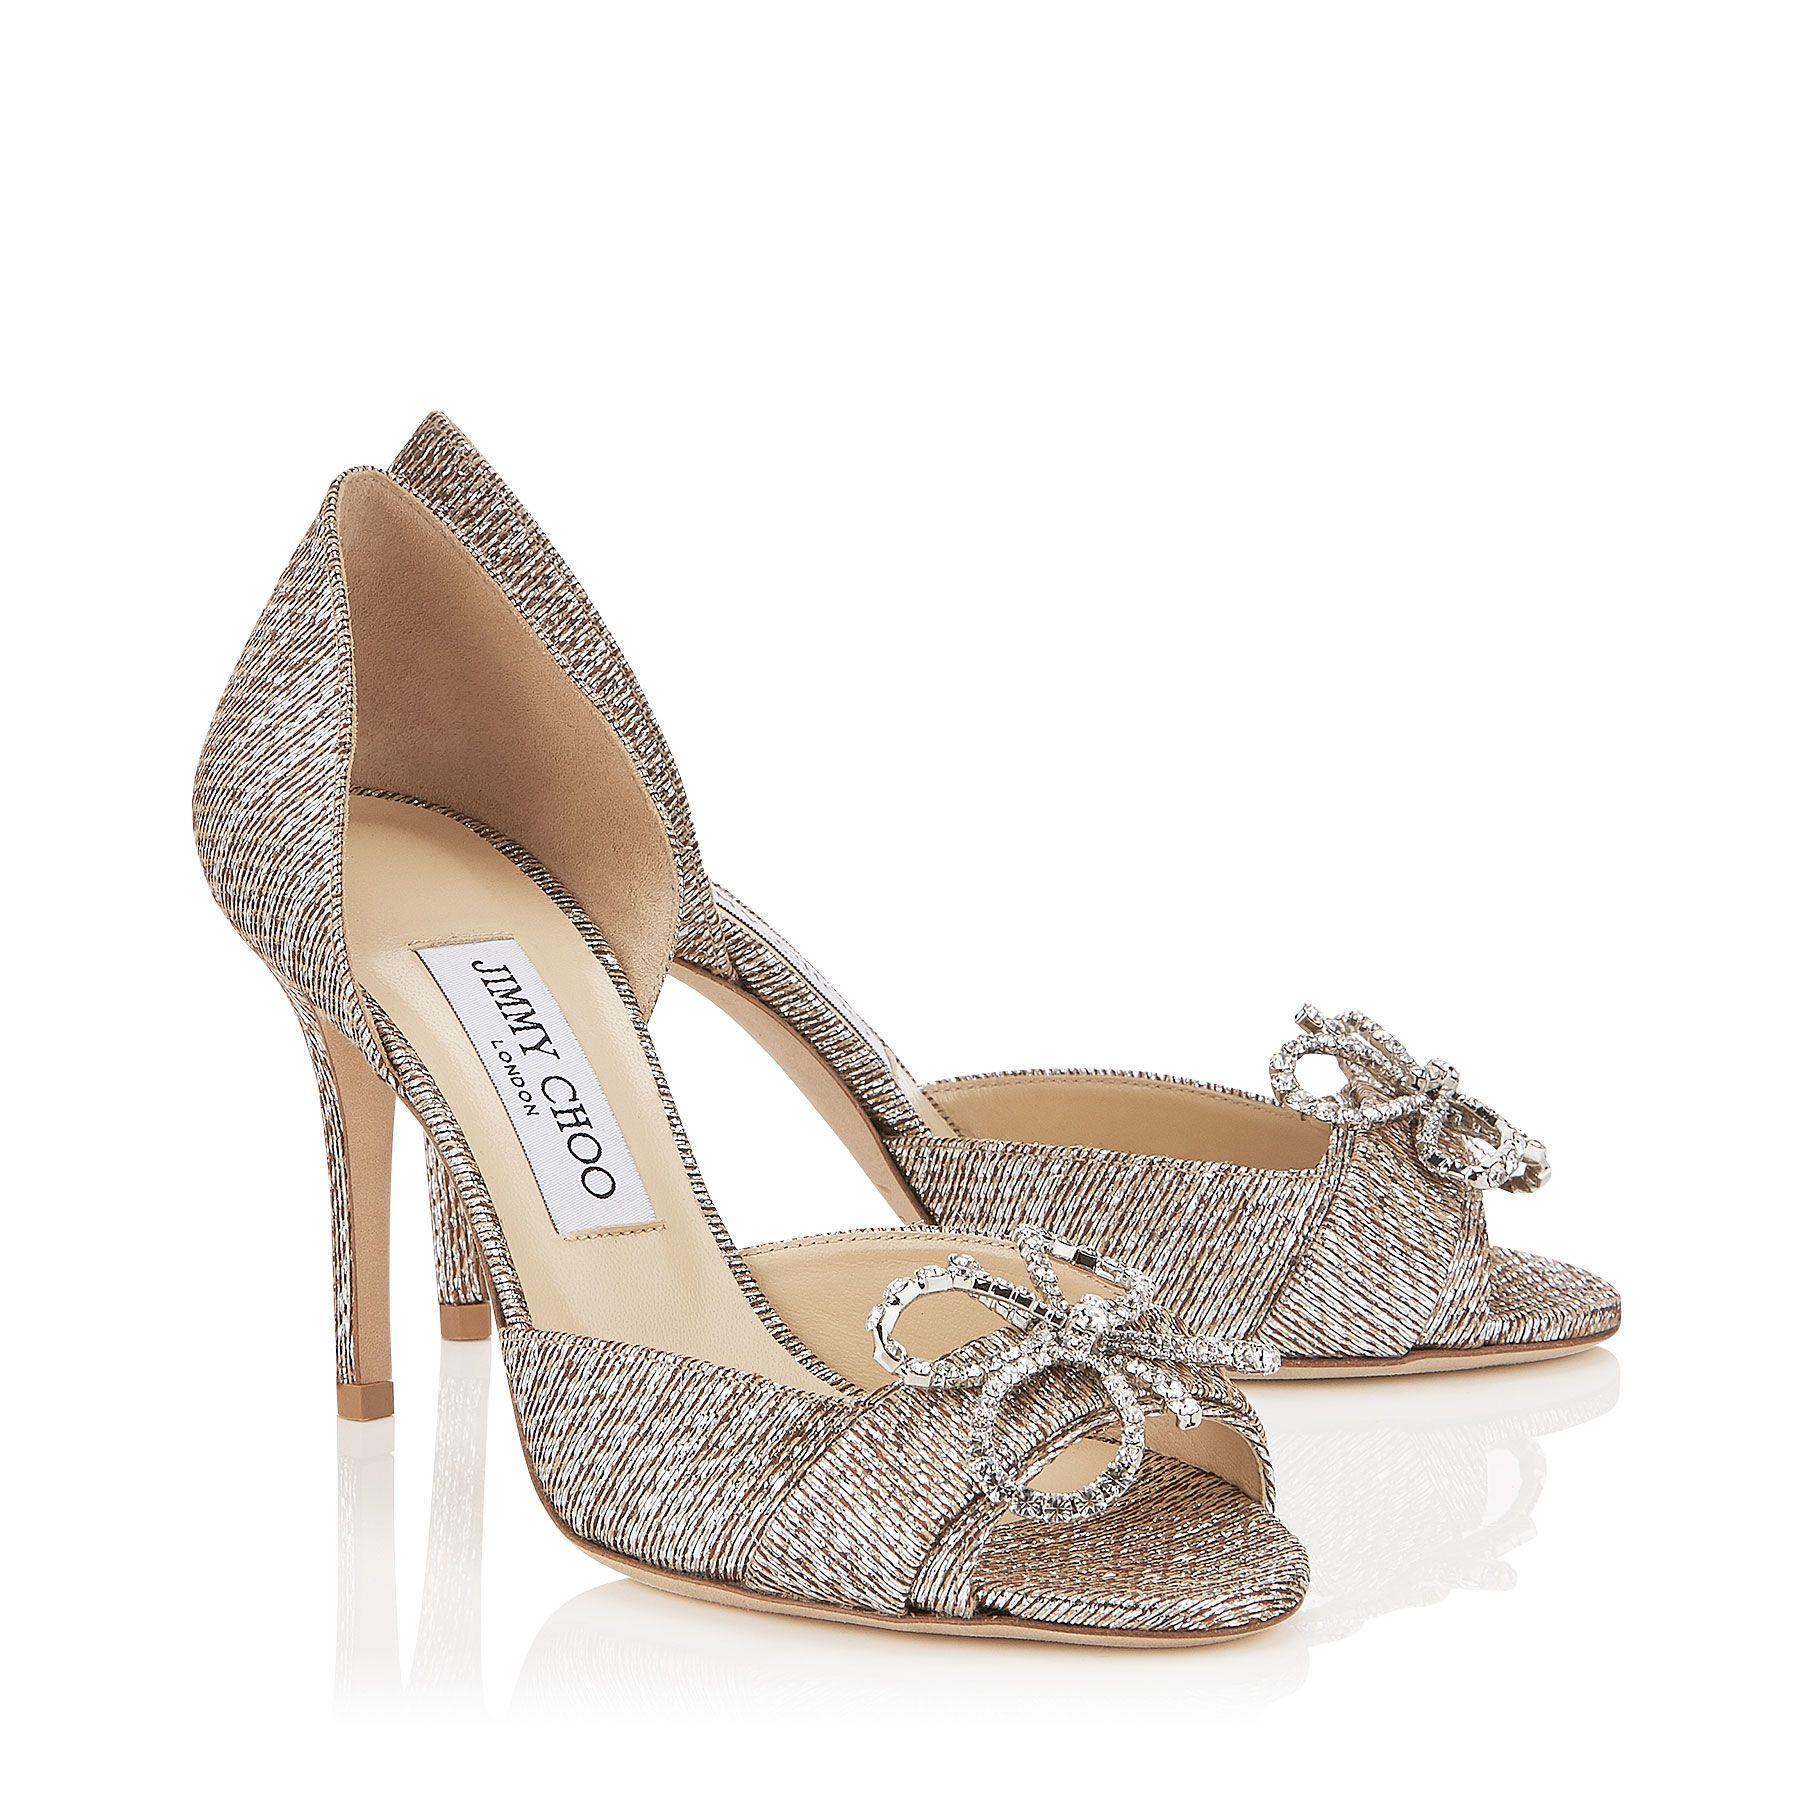 Jimmy Choo 'Kayden' sandals Women Shoesjimmy choo wedding sandalsinnovative design